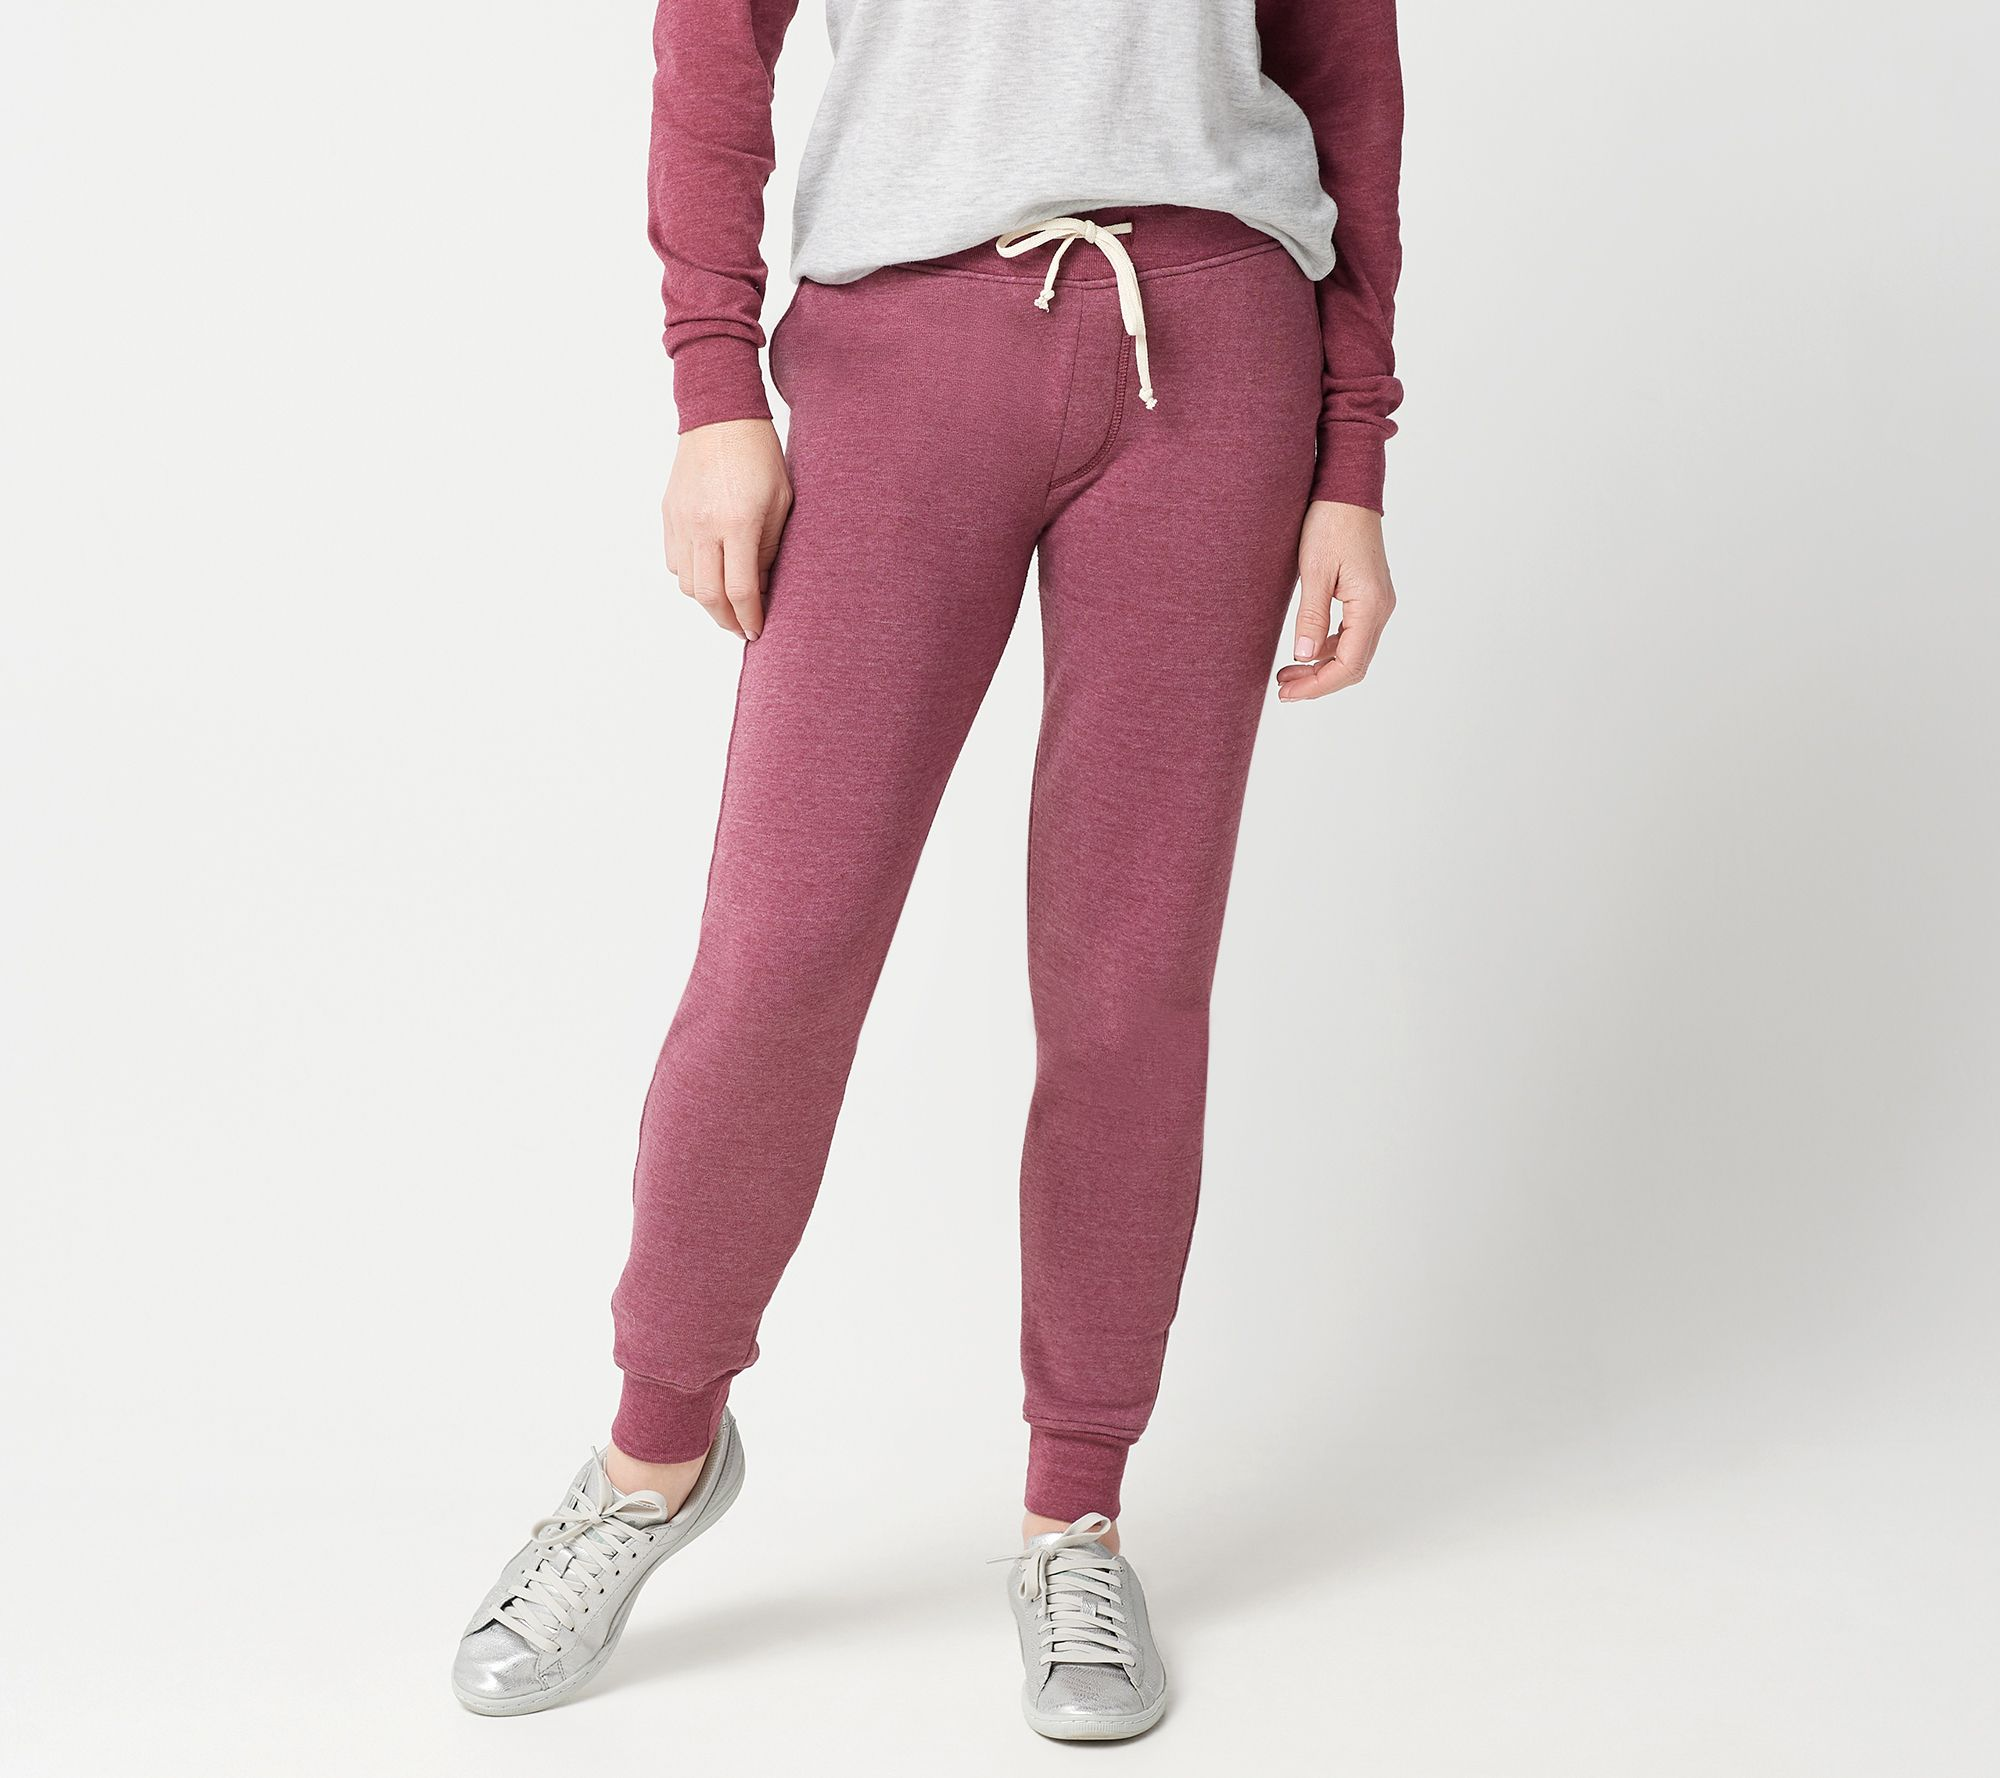 Laura Scott Missy Fleece Sweat Pants Multi Colors and Sizes